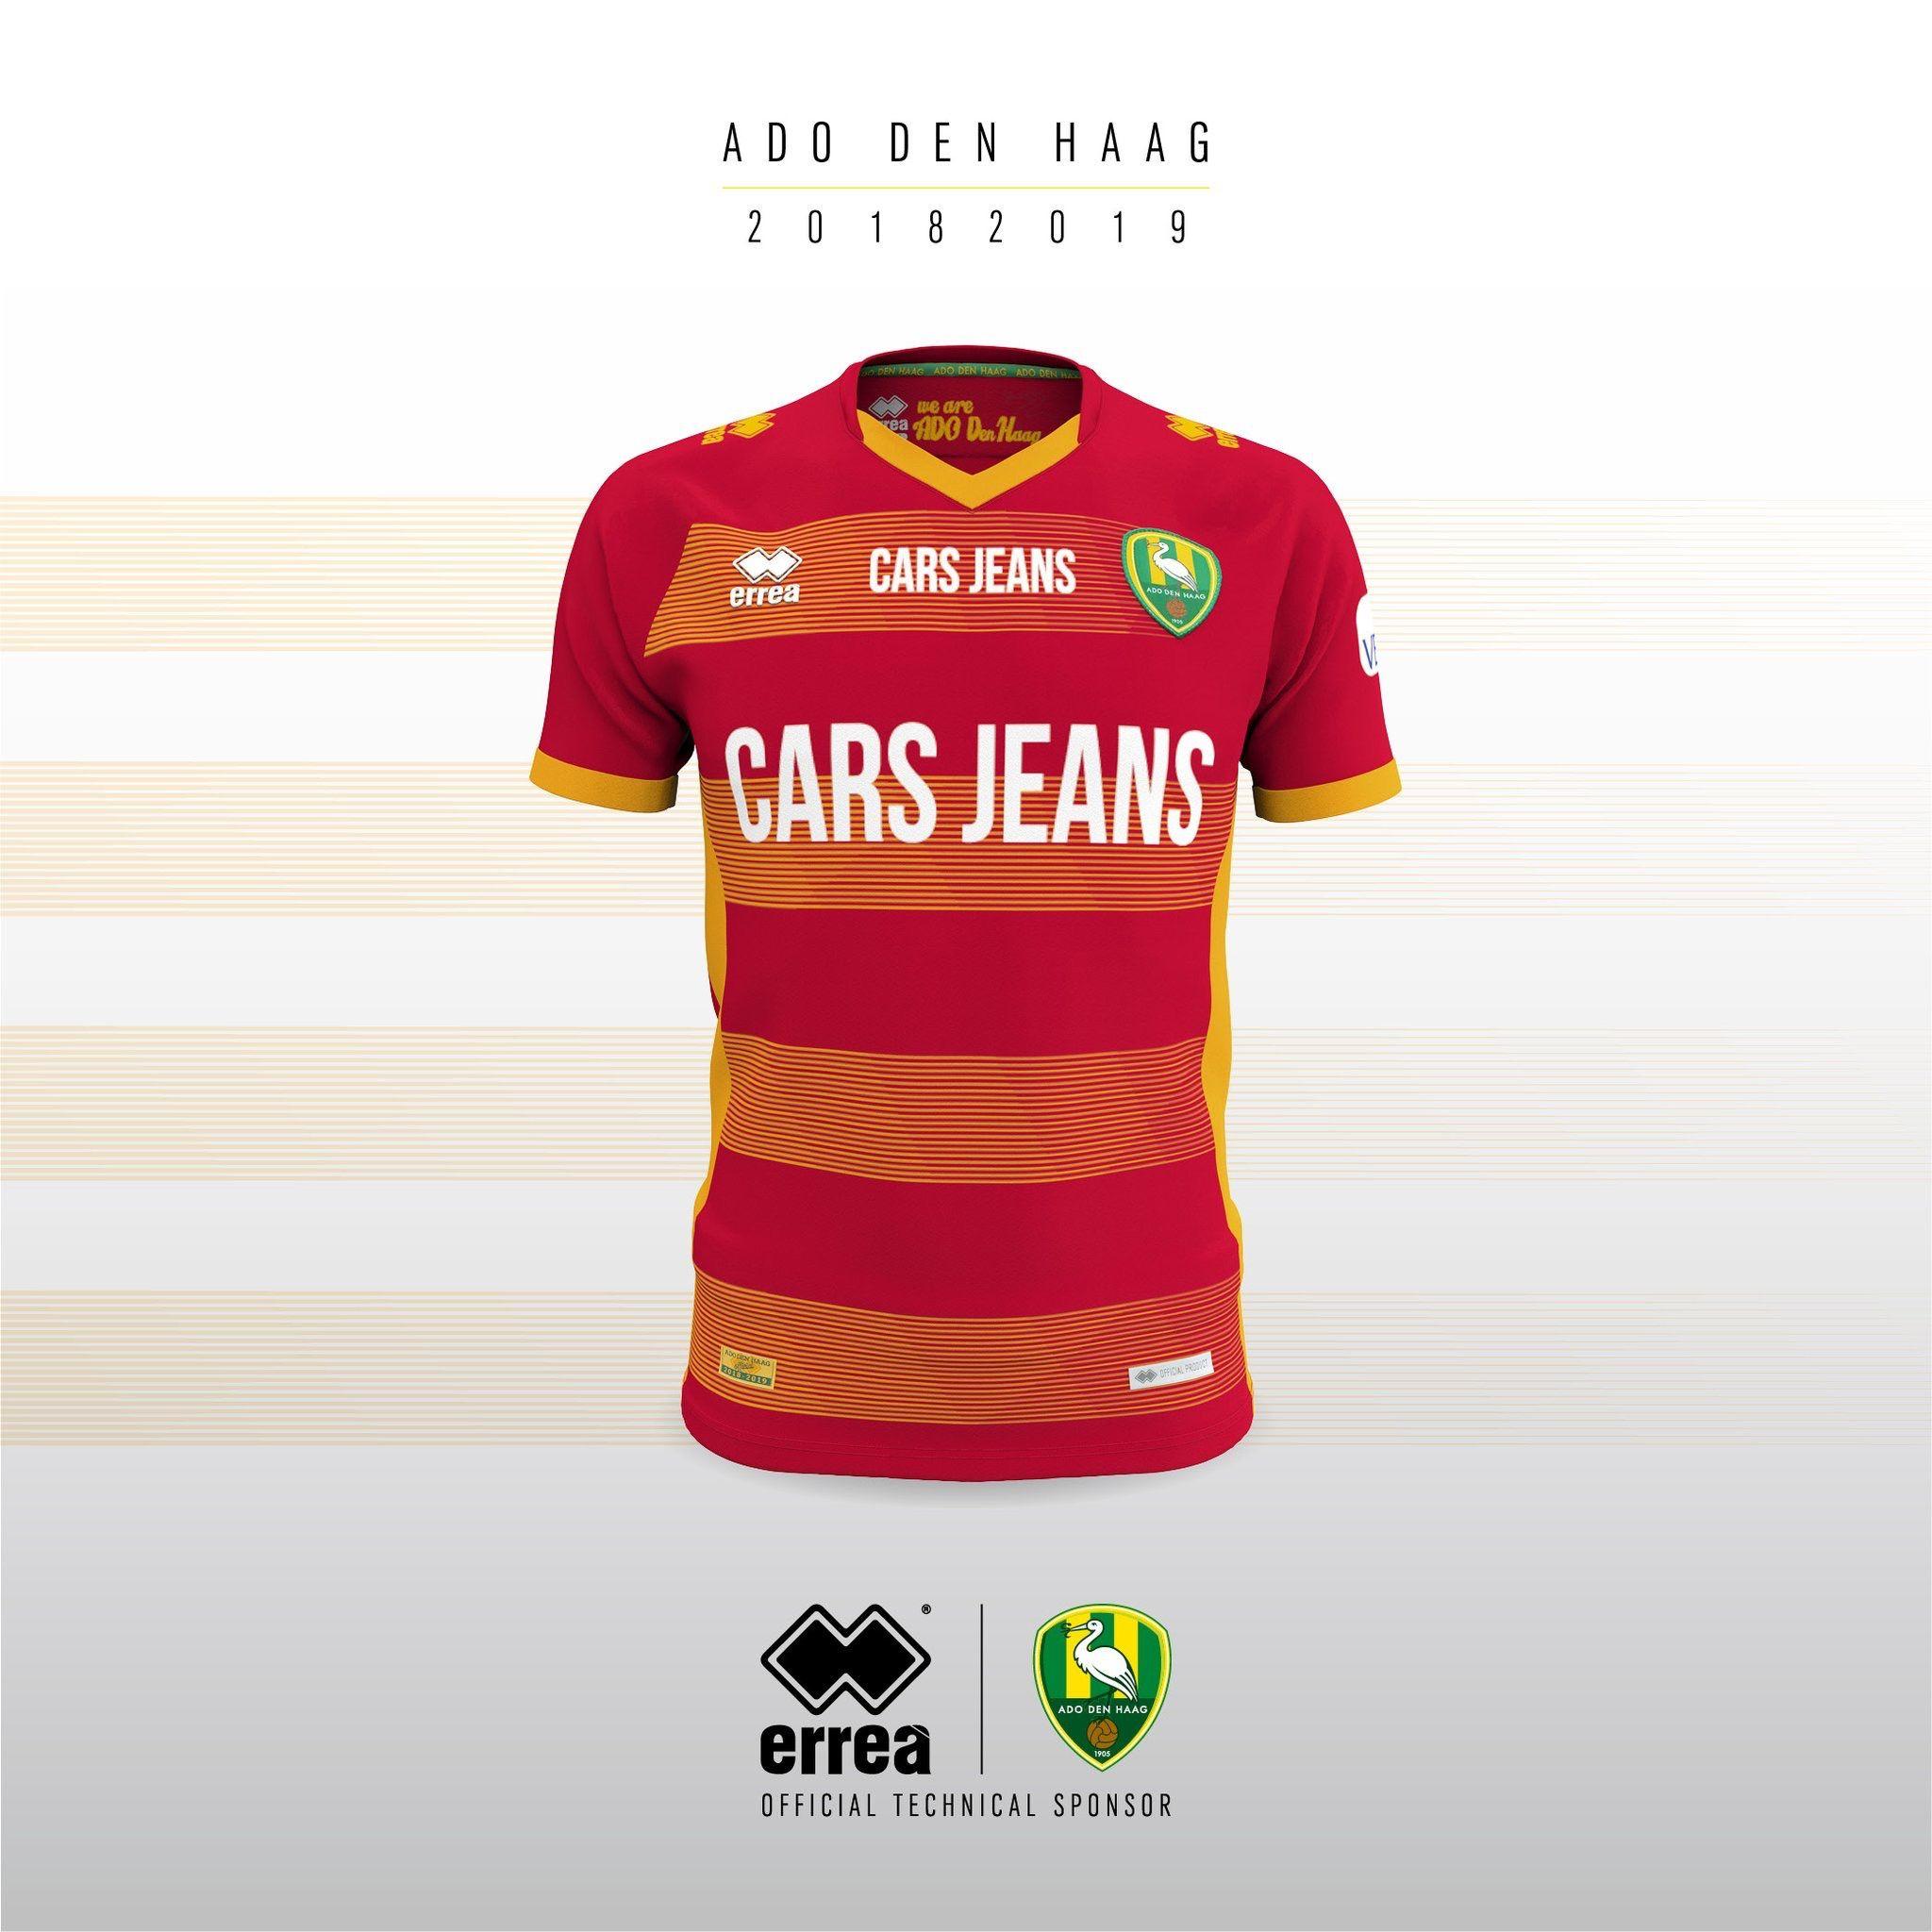 Ado Den Haag 2018 2019 Away Kit Camisetas Jeans Futbol